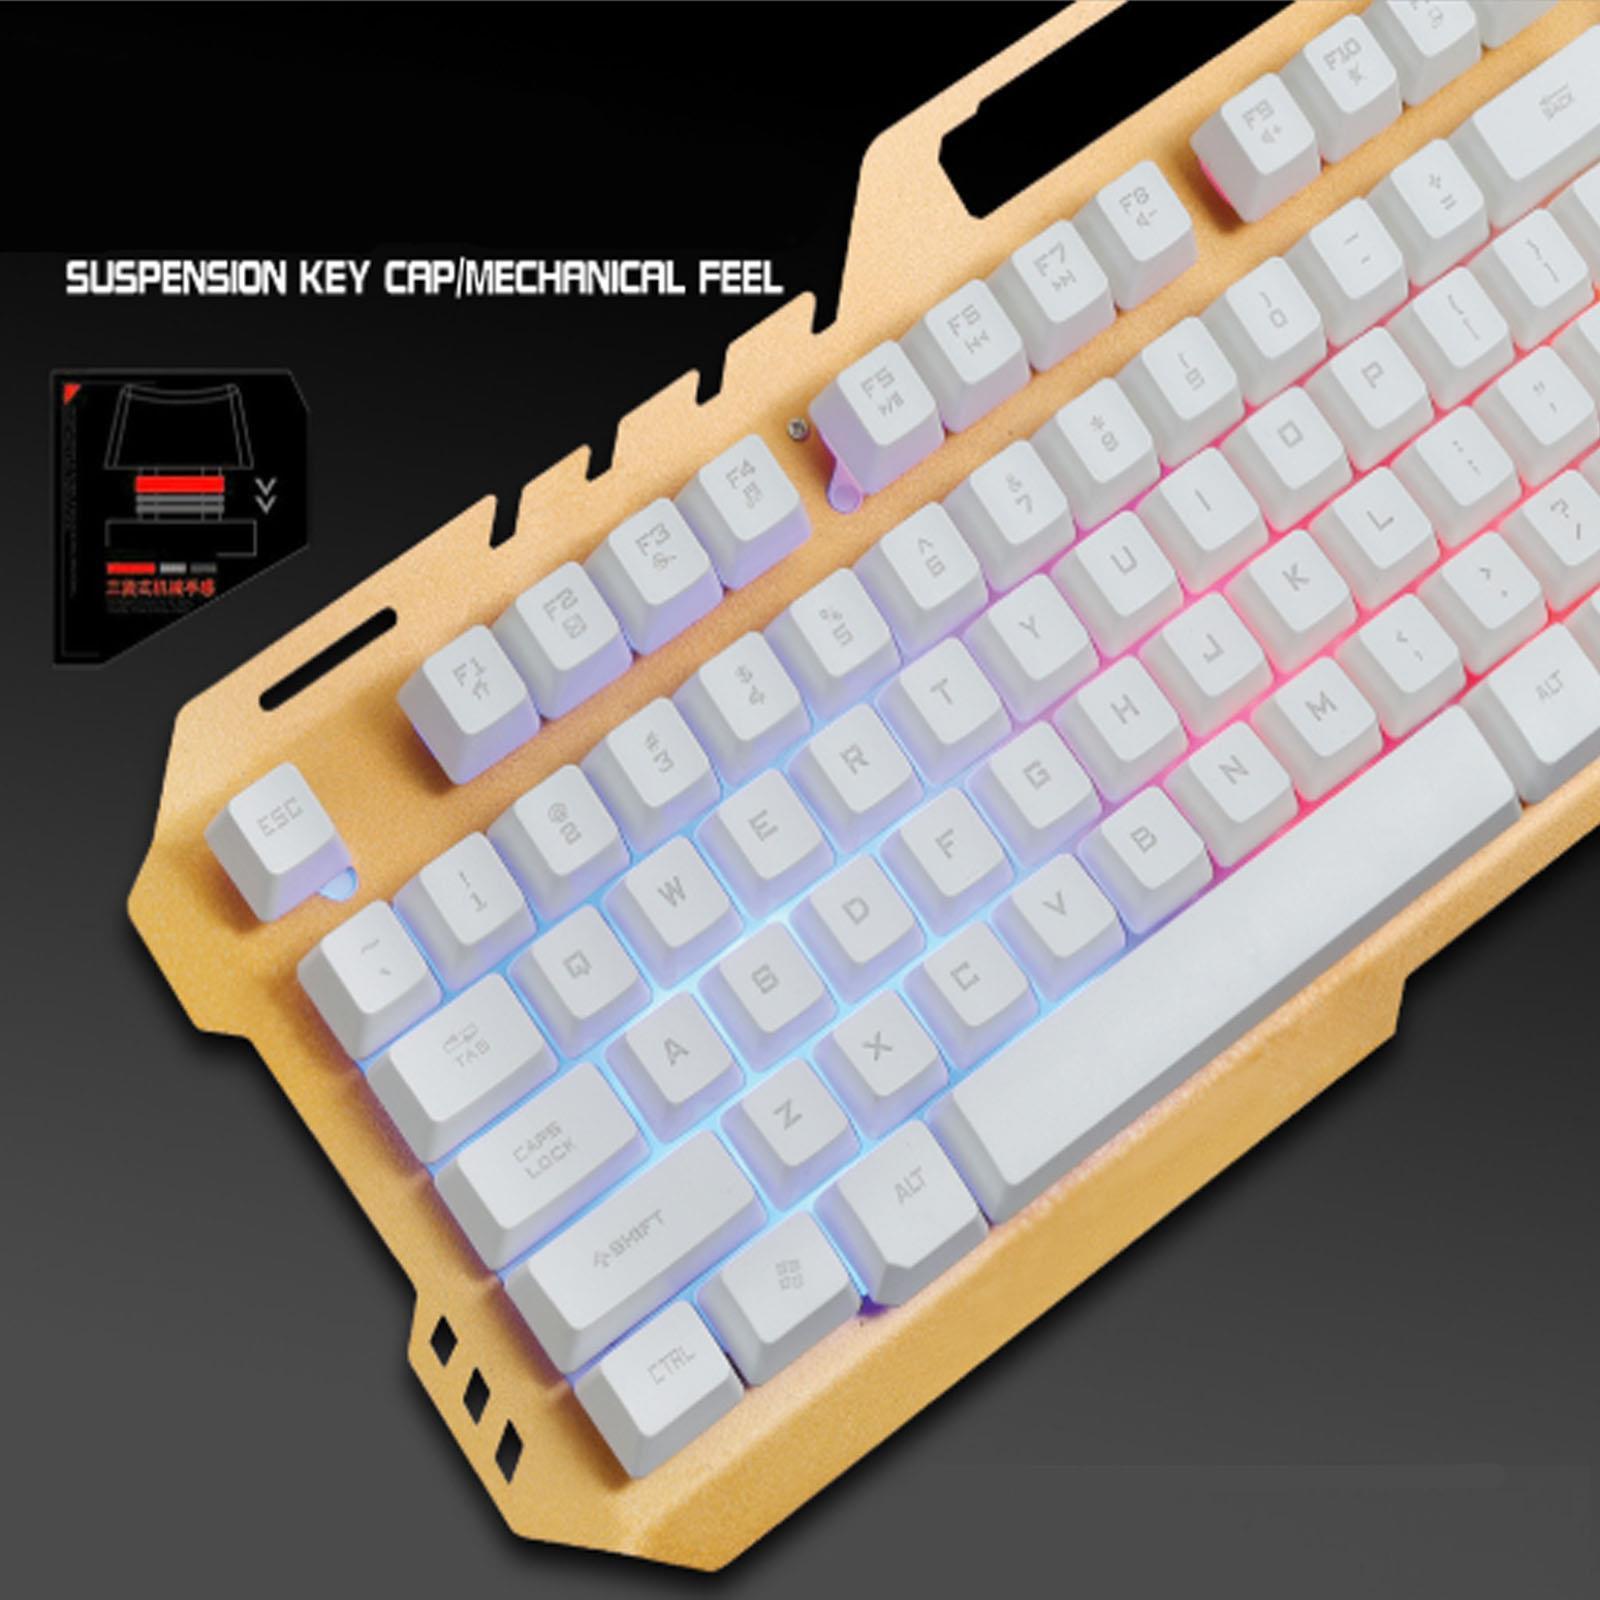 Gaming-Keyboard-Mouse-Backlit-Rainbow-LED-USB-Set-for-PC-Laptop-PS4-Xbox-One thumbnail 44